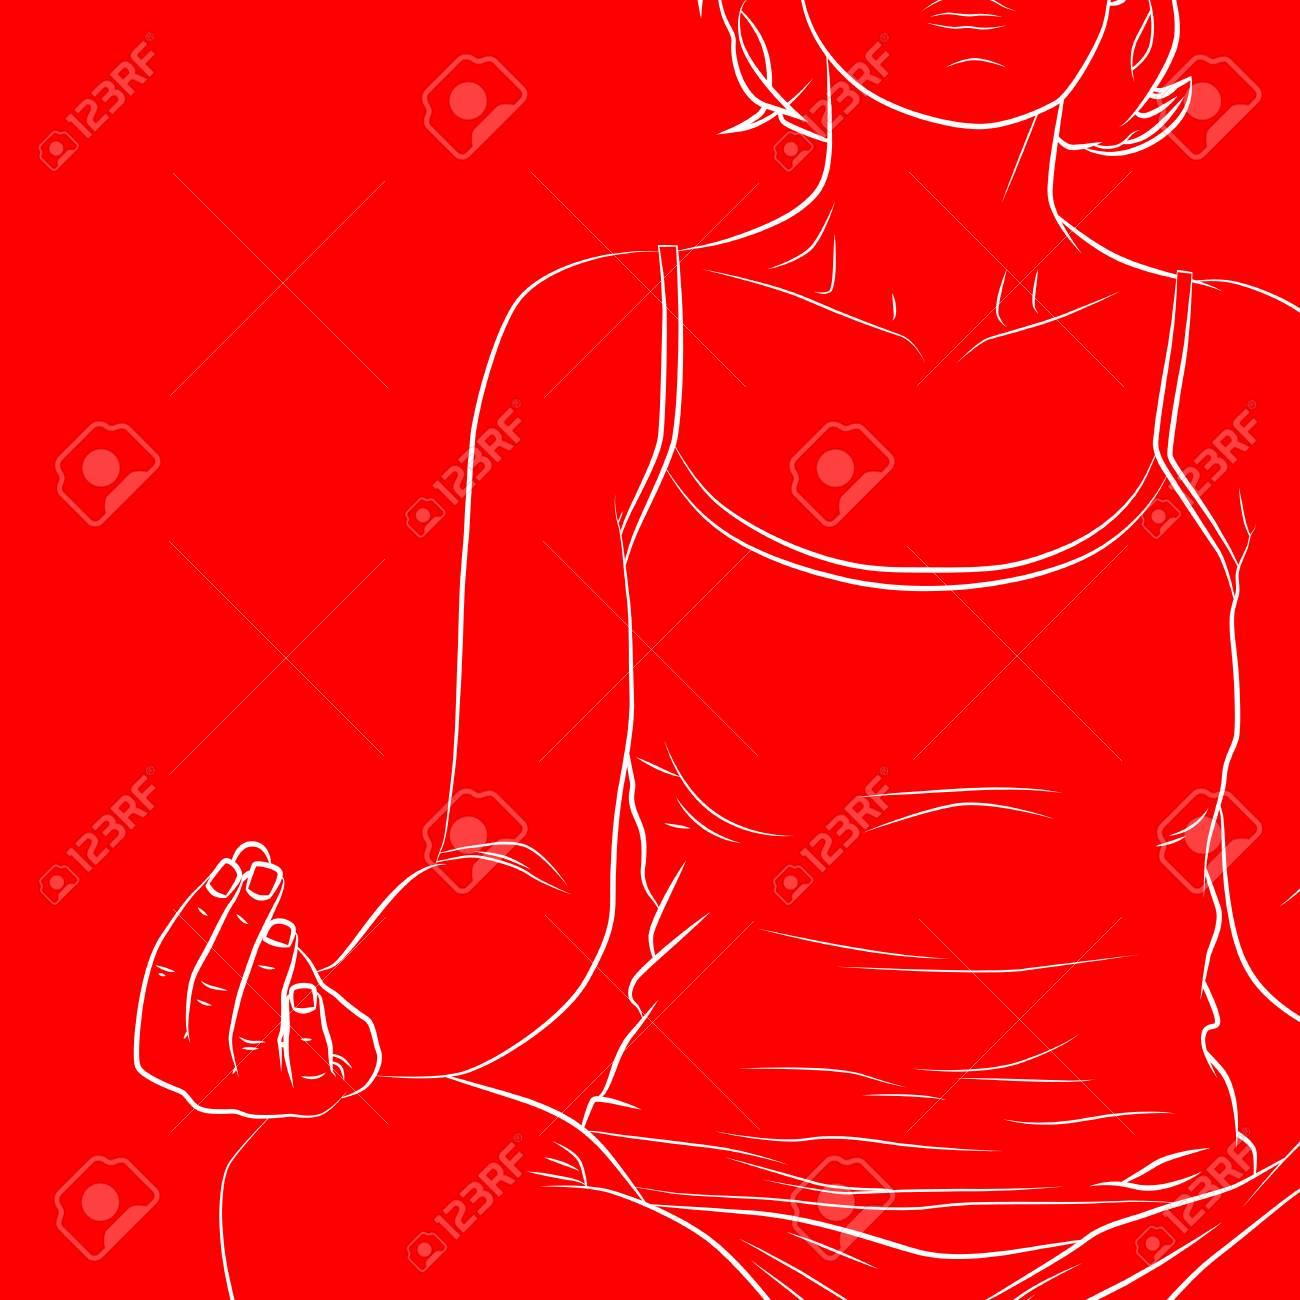 Yoga concept. Comic book style vector line art of a woman doing yoga, meditating. - 110775977